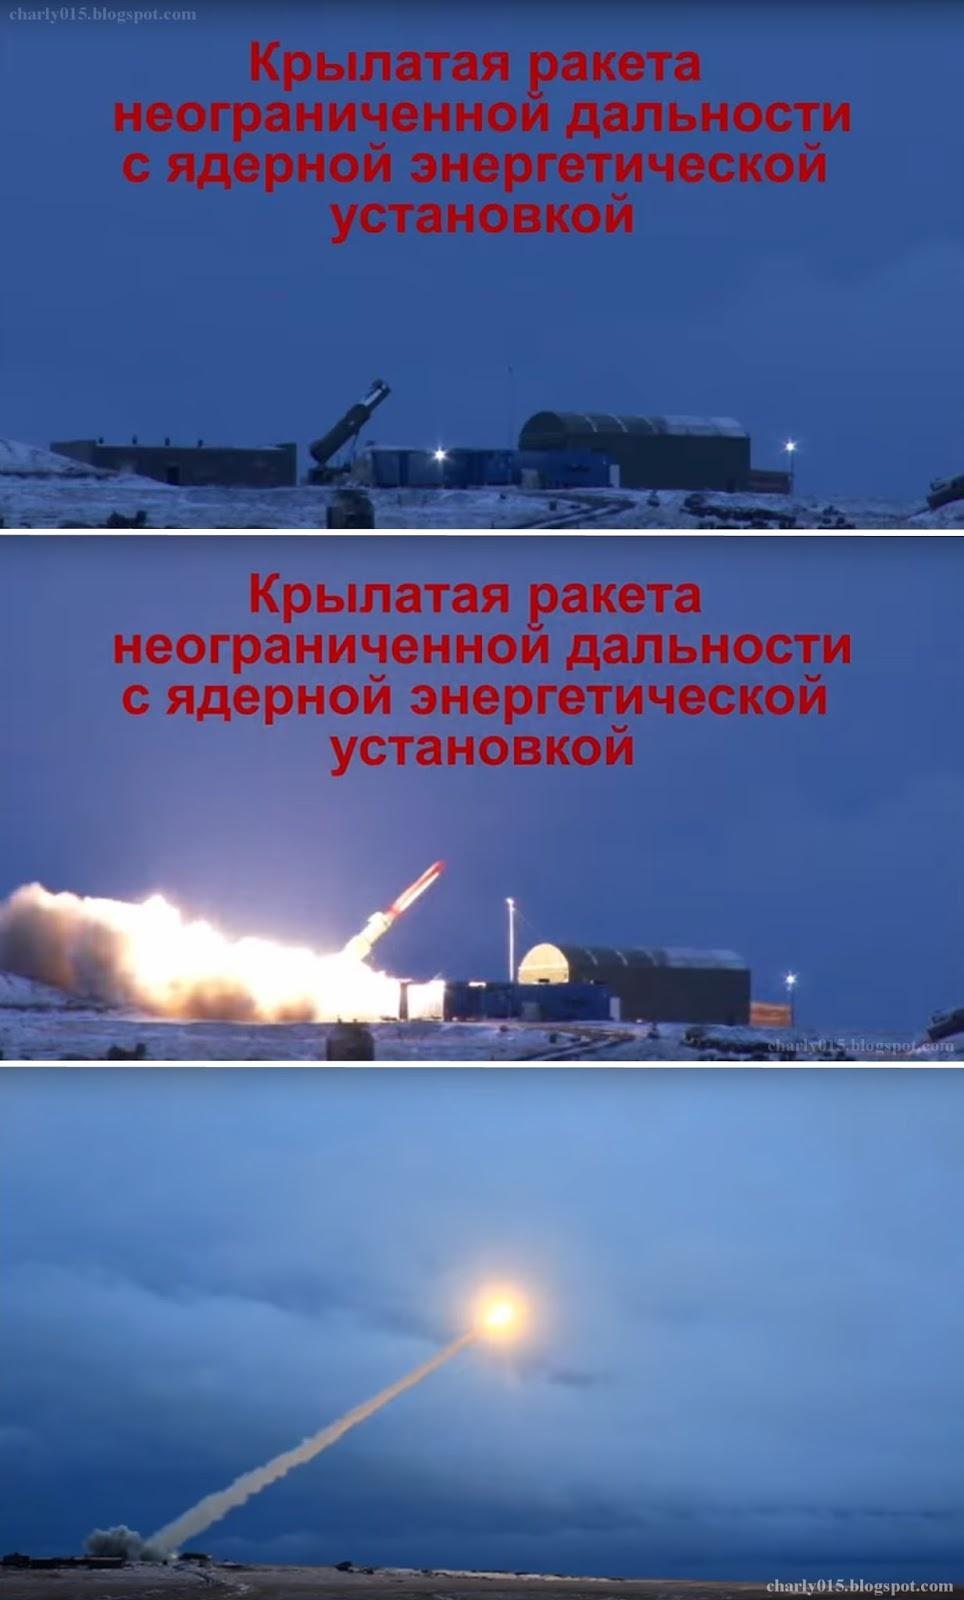 misil%2Bde%2Bcrucero%2Bnuclear.jpg